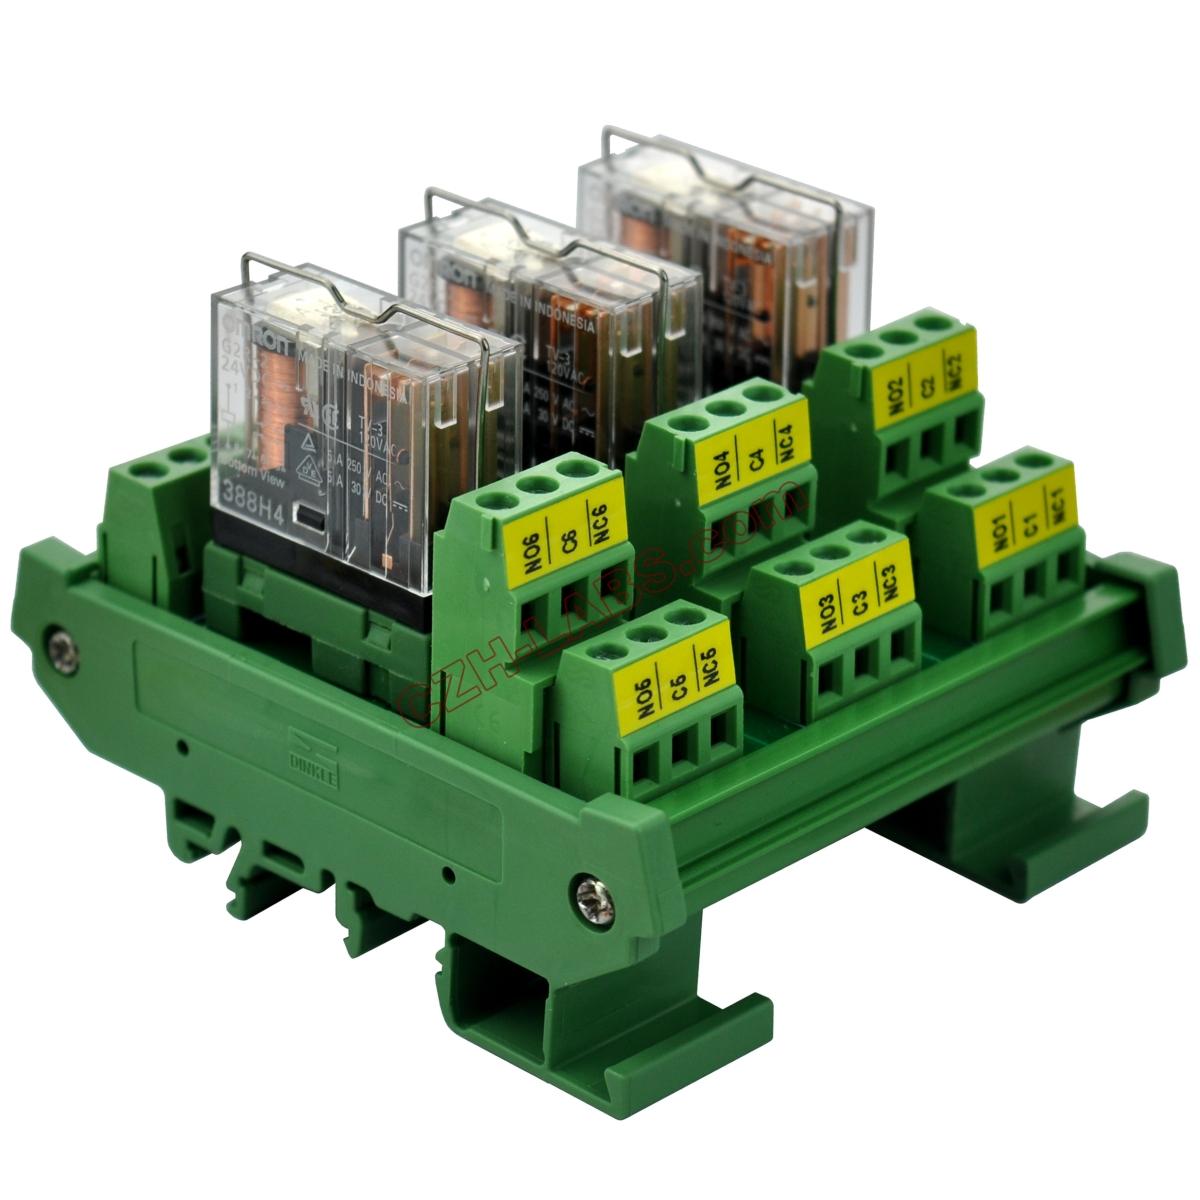 Electronics-Salon Slim DIN Rail Mount 16A//300V 1x13 Position Screw Terminal Block Distribution Module.